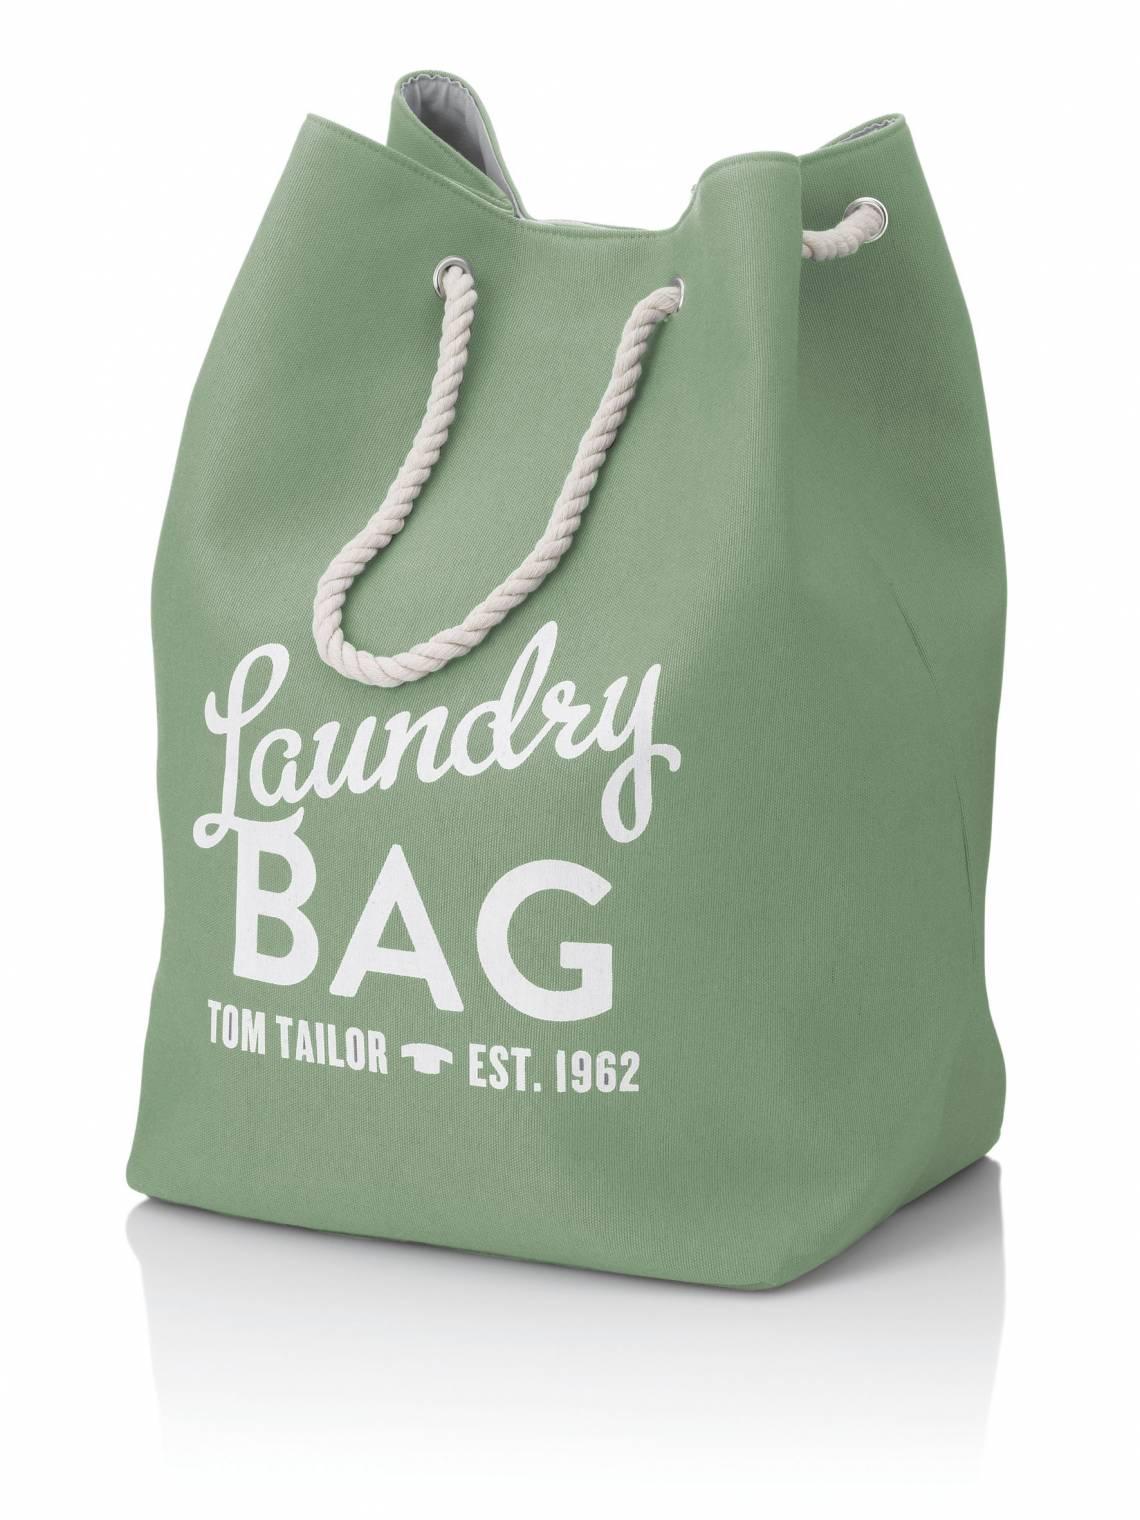 Tom Tailor LAUNDRY BAG Wäschesack